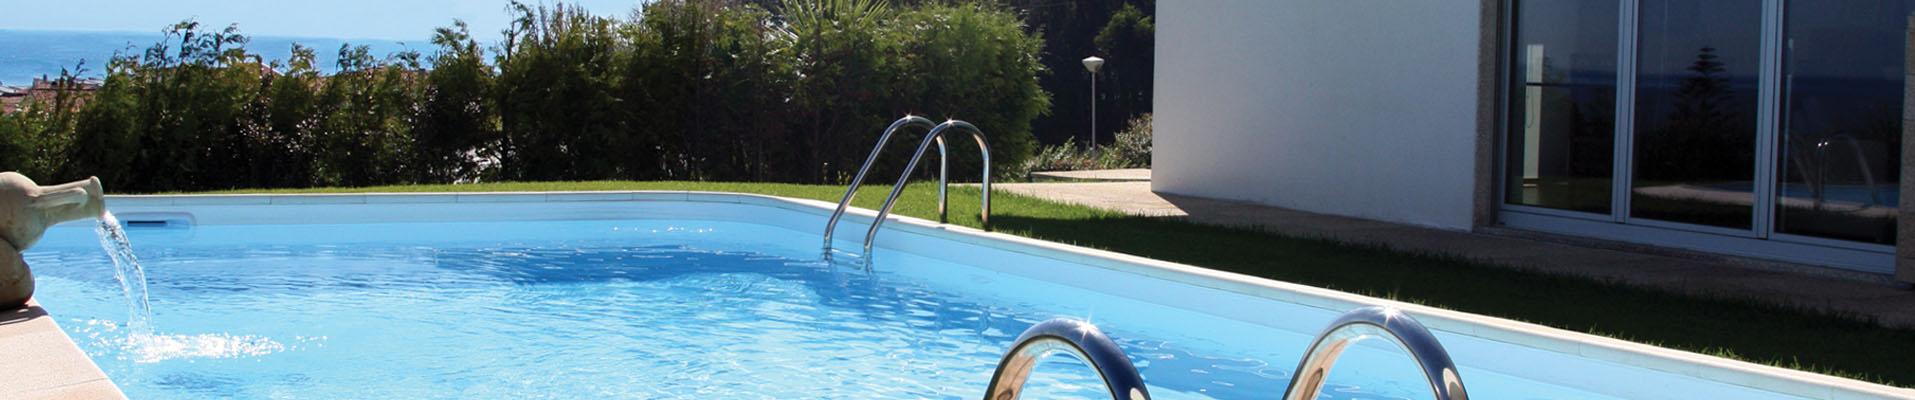 acessorios para piscinas LINOV